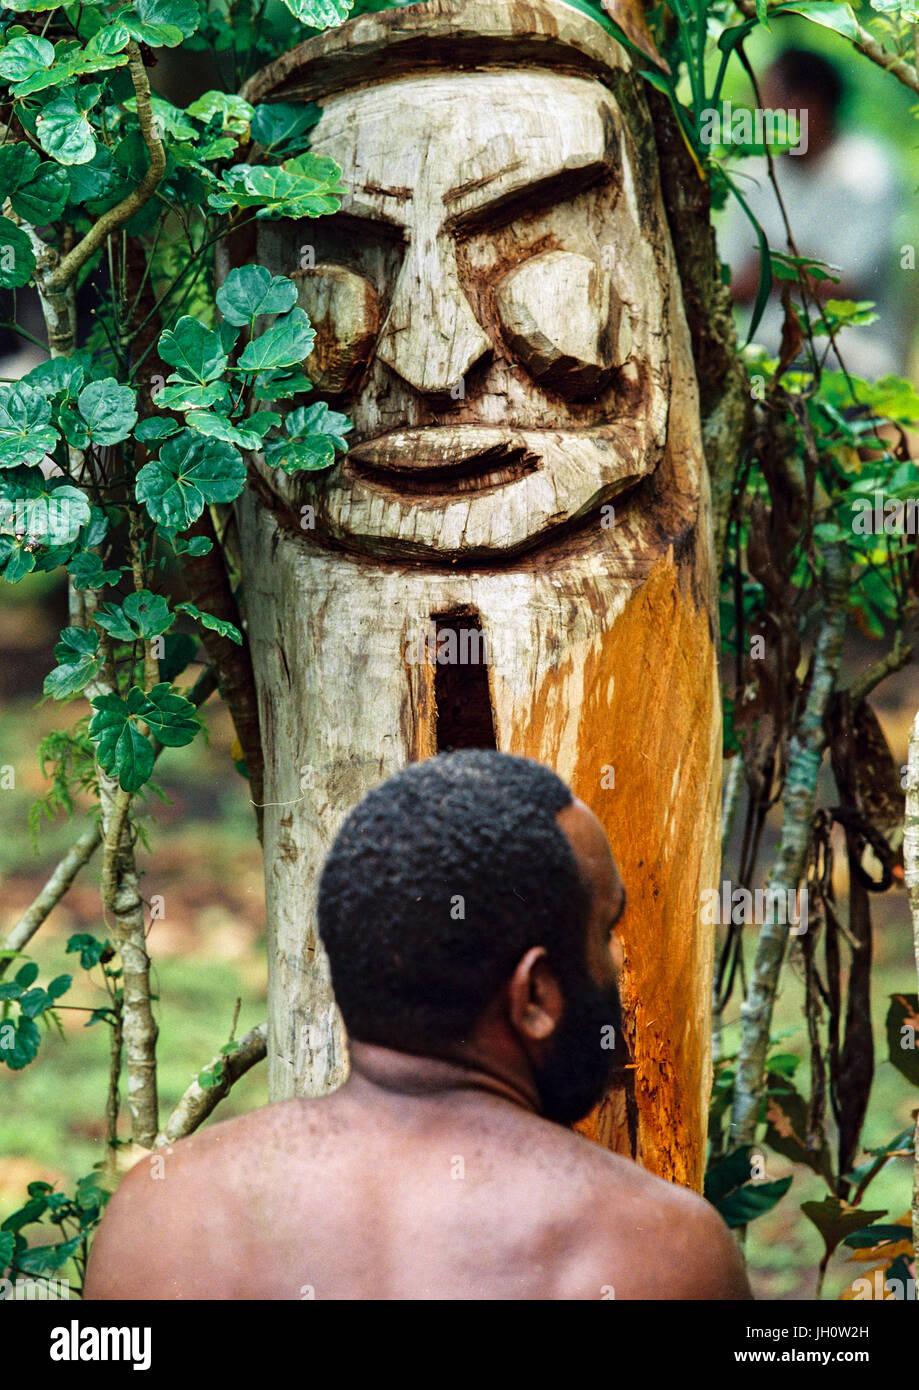 Tribesman beating a drum during a ceremony in the jungle, Malampa Province, Malekula Island, Vanuatu - Stock Image